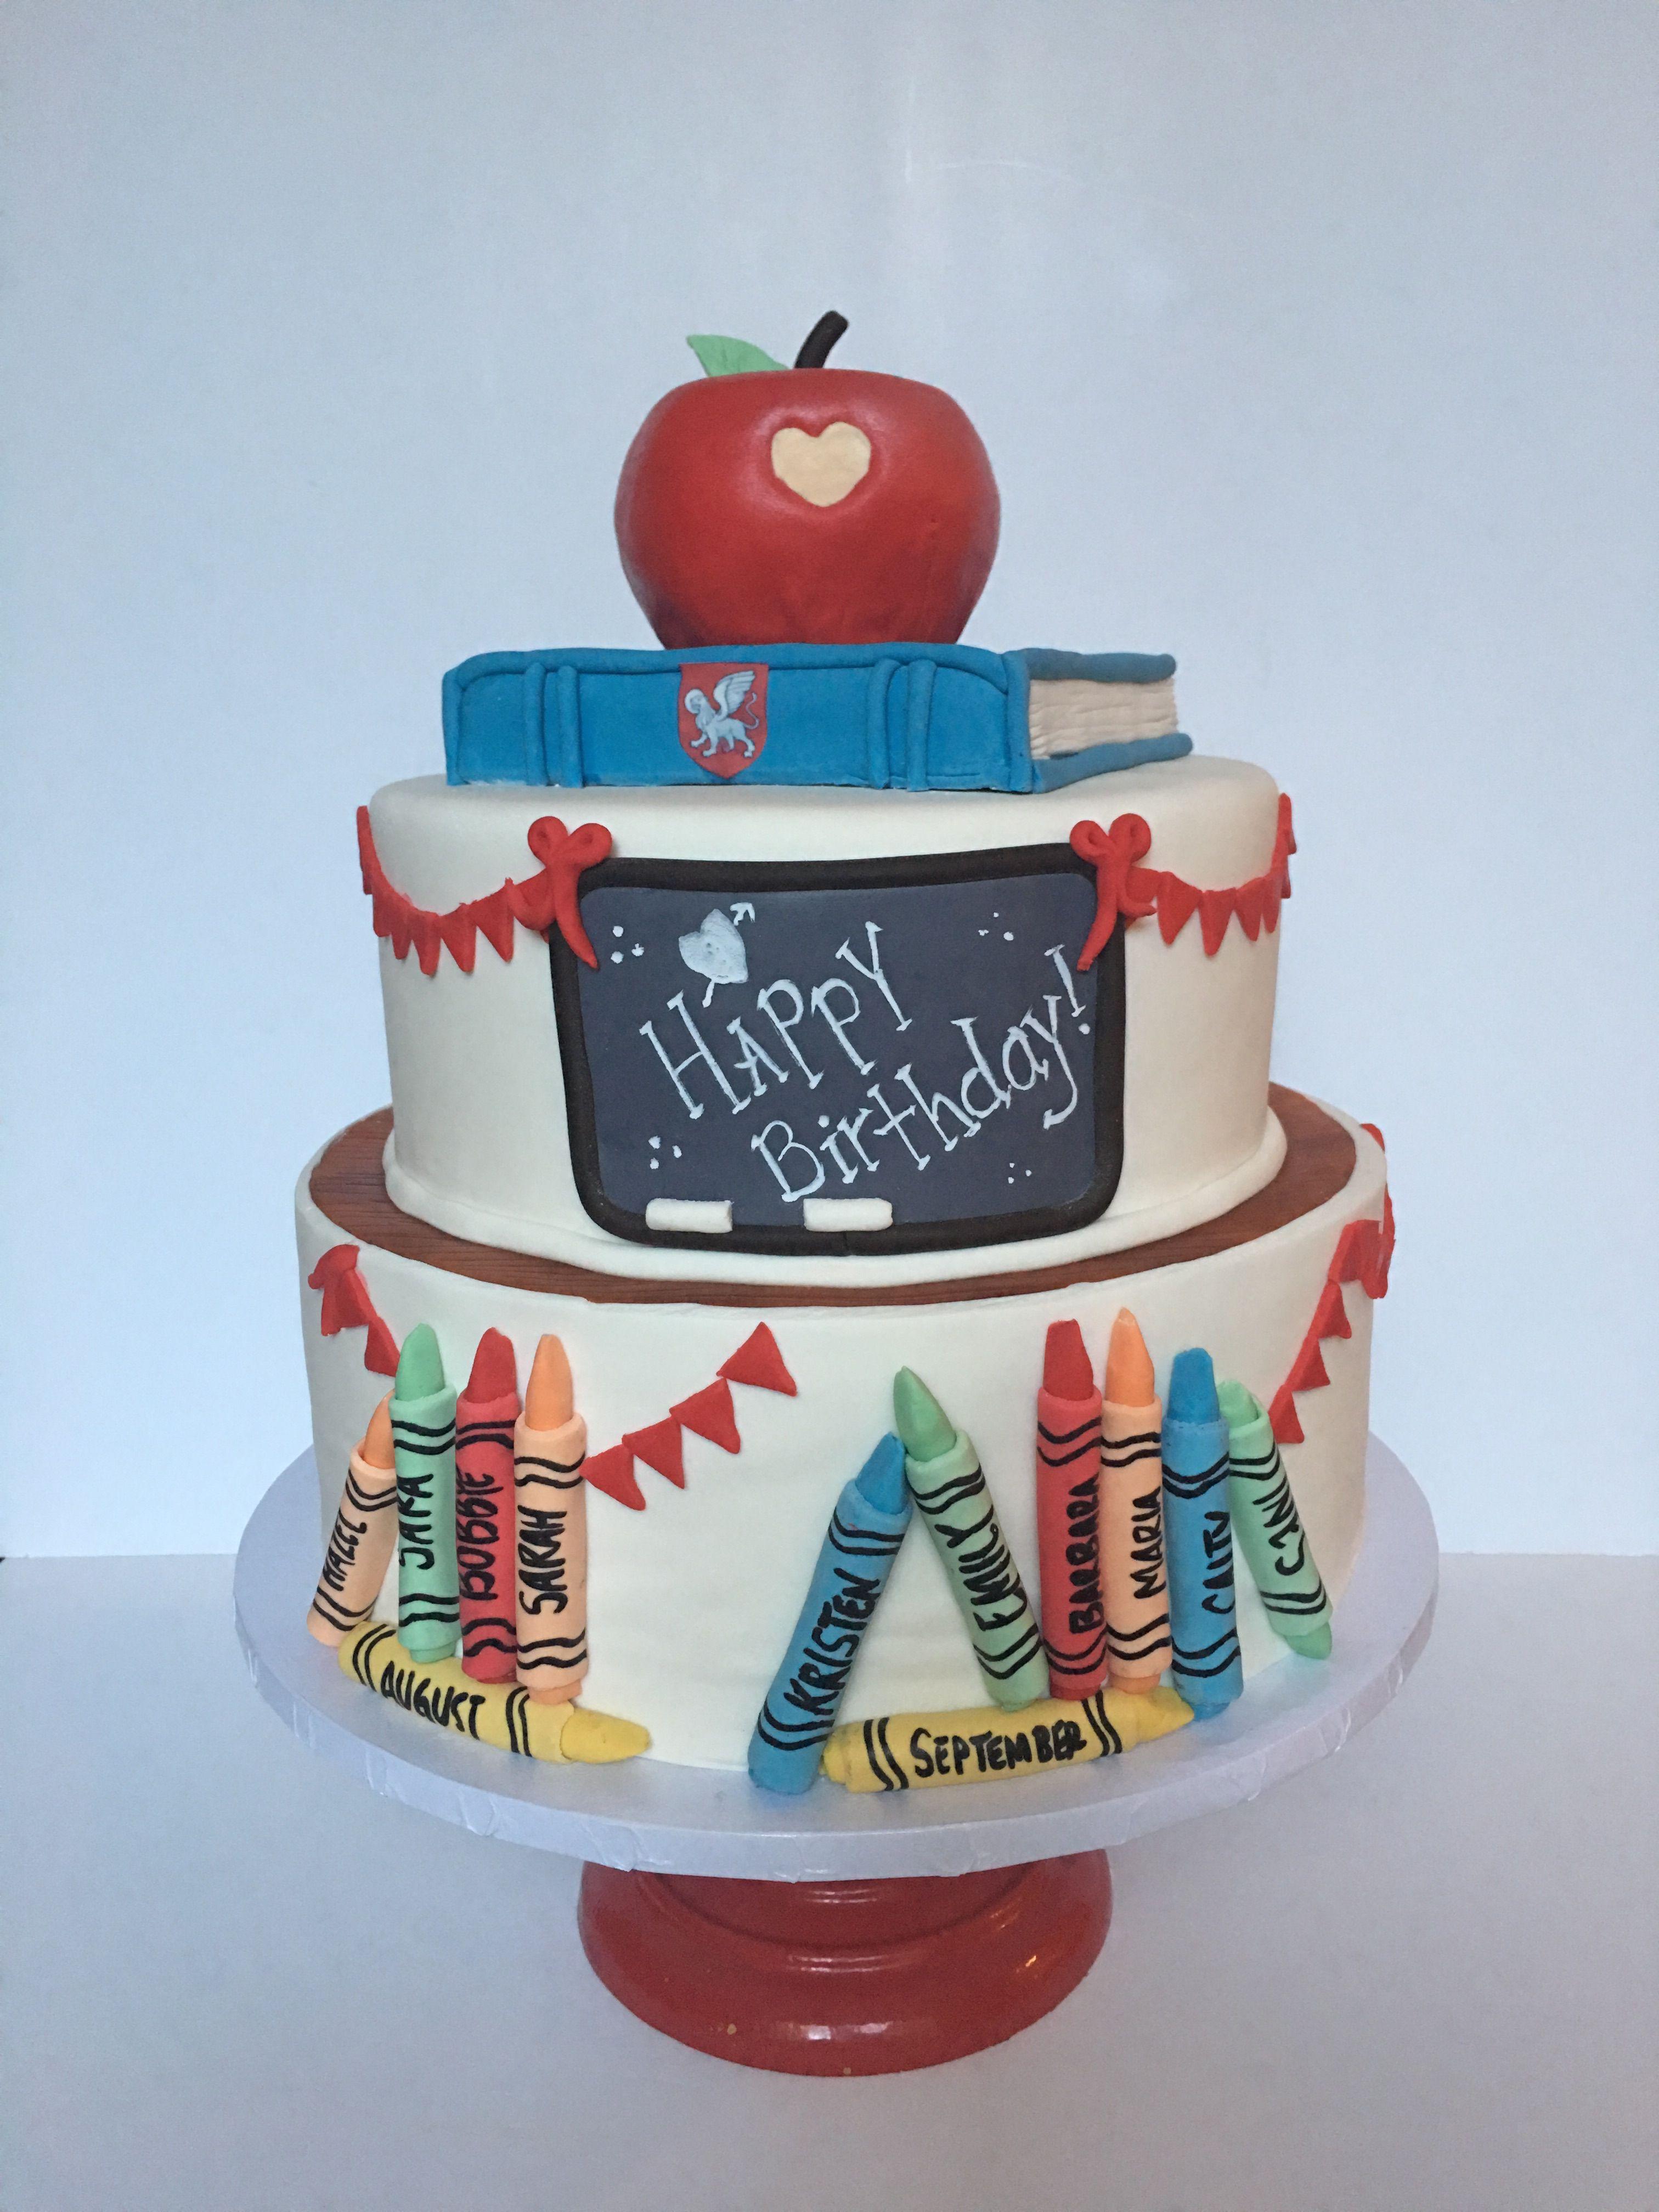 Teacher appreciation cake This teacher birthday cake celebrates